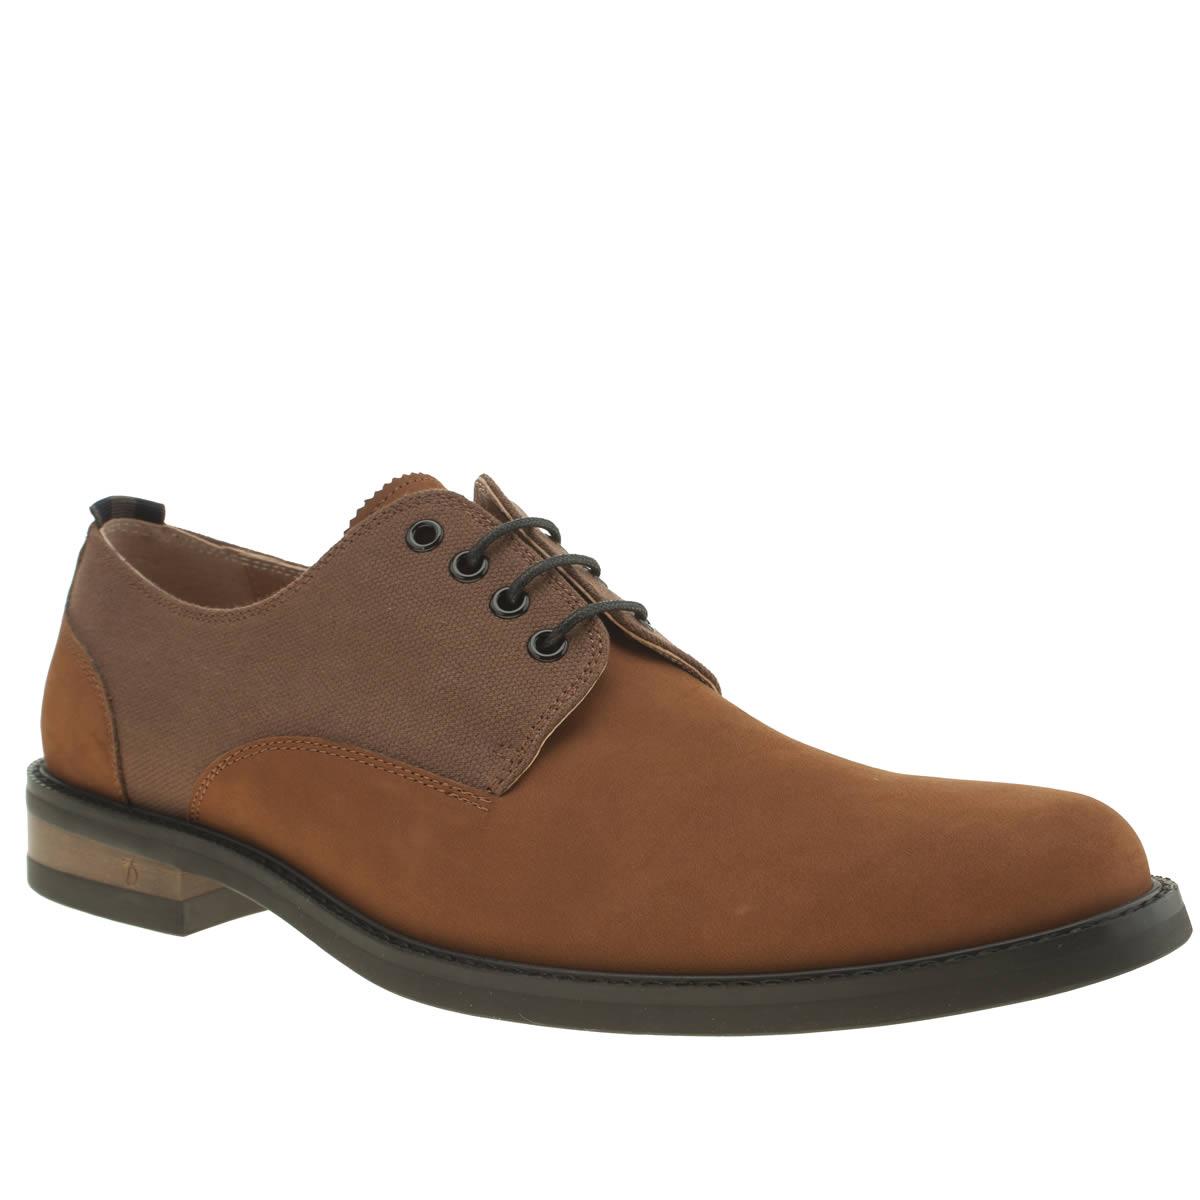 Peter Werth Peter Werth Tan Atkinson Derby Shoes